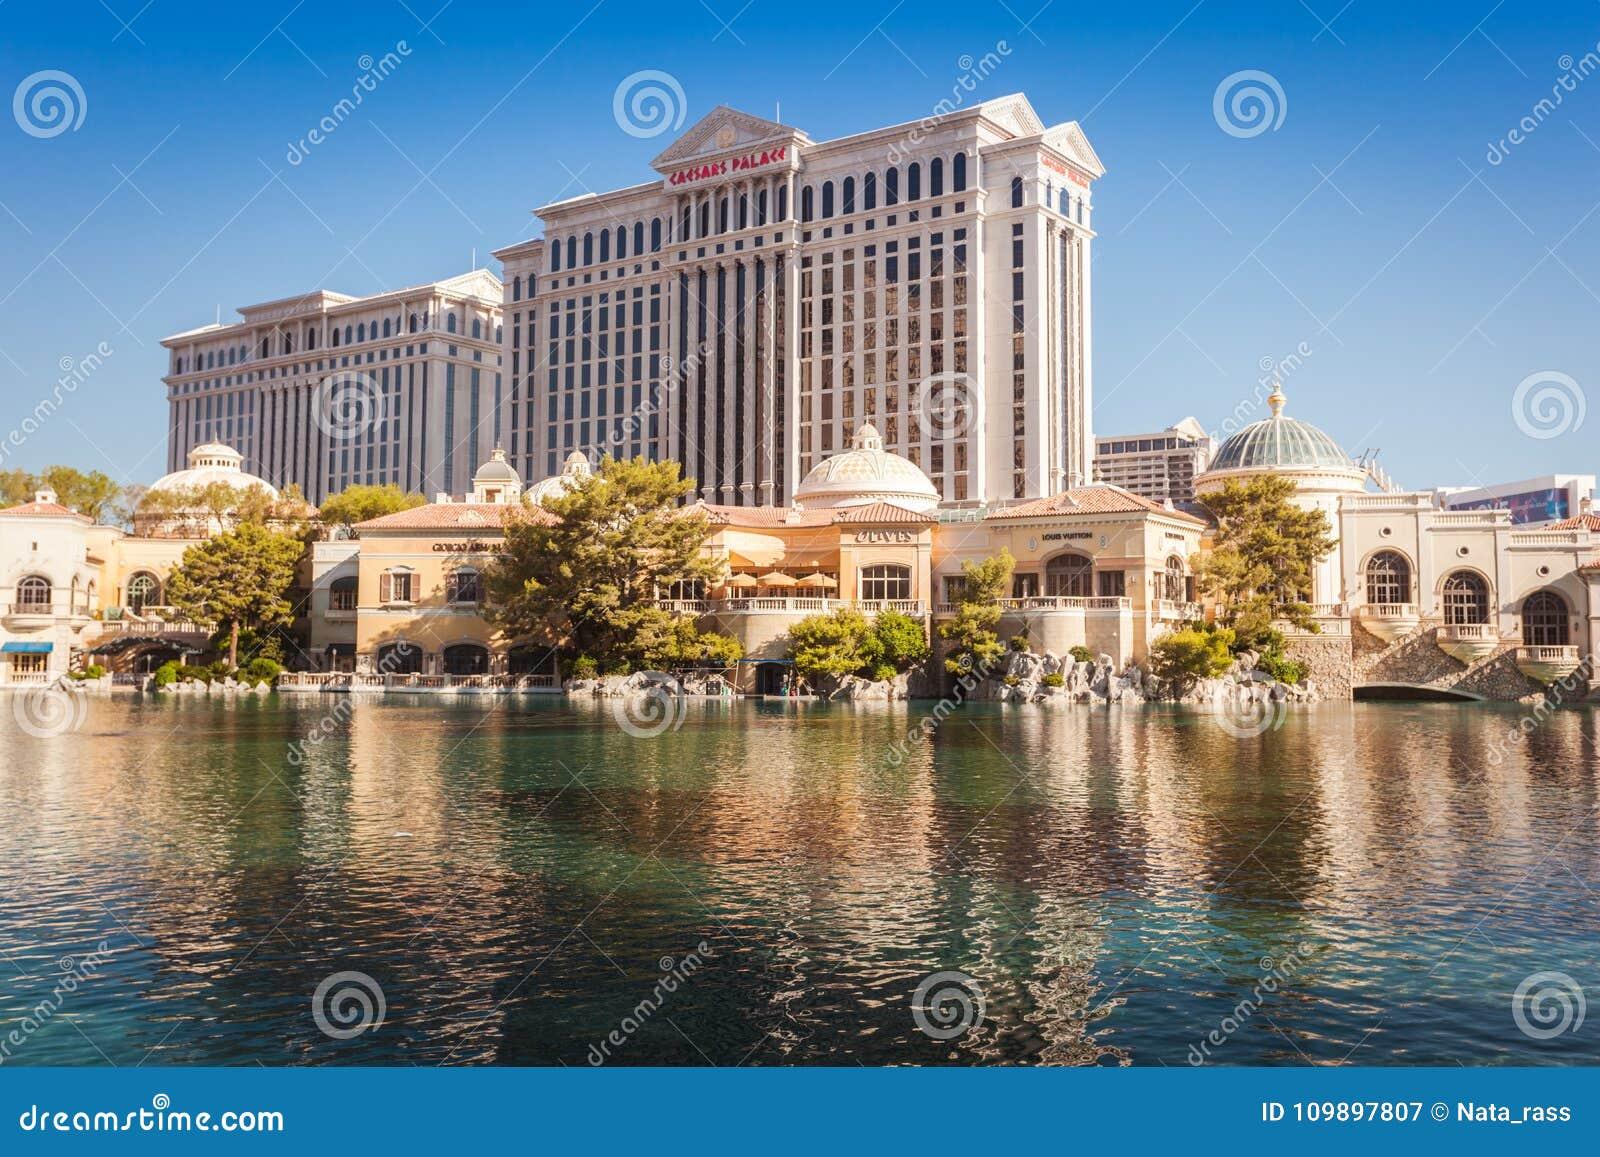 Caesar Palace Casino In Las Vegas Editorial Photography Image Of Entertainment Caesar 109897807